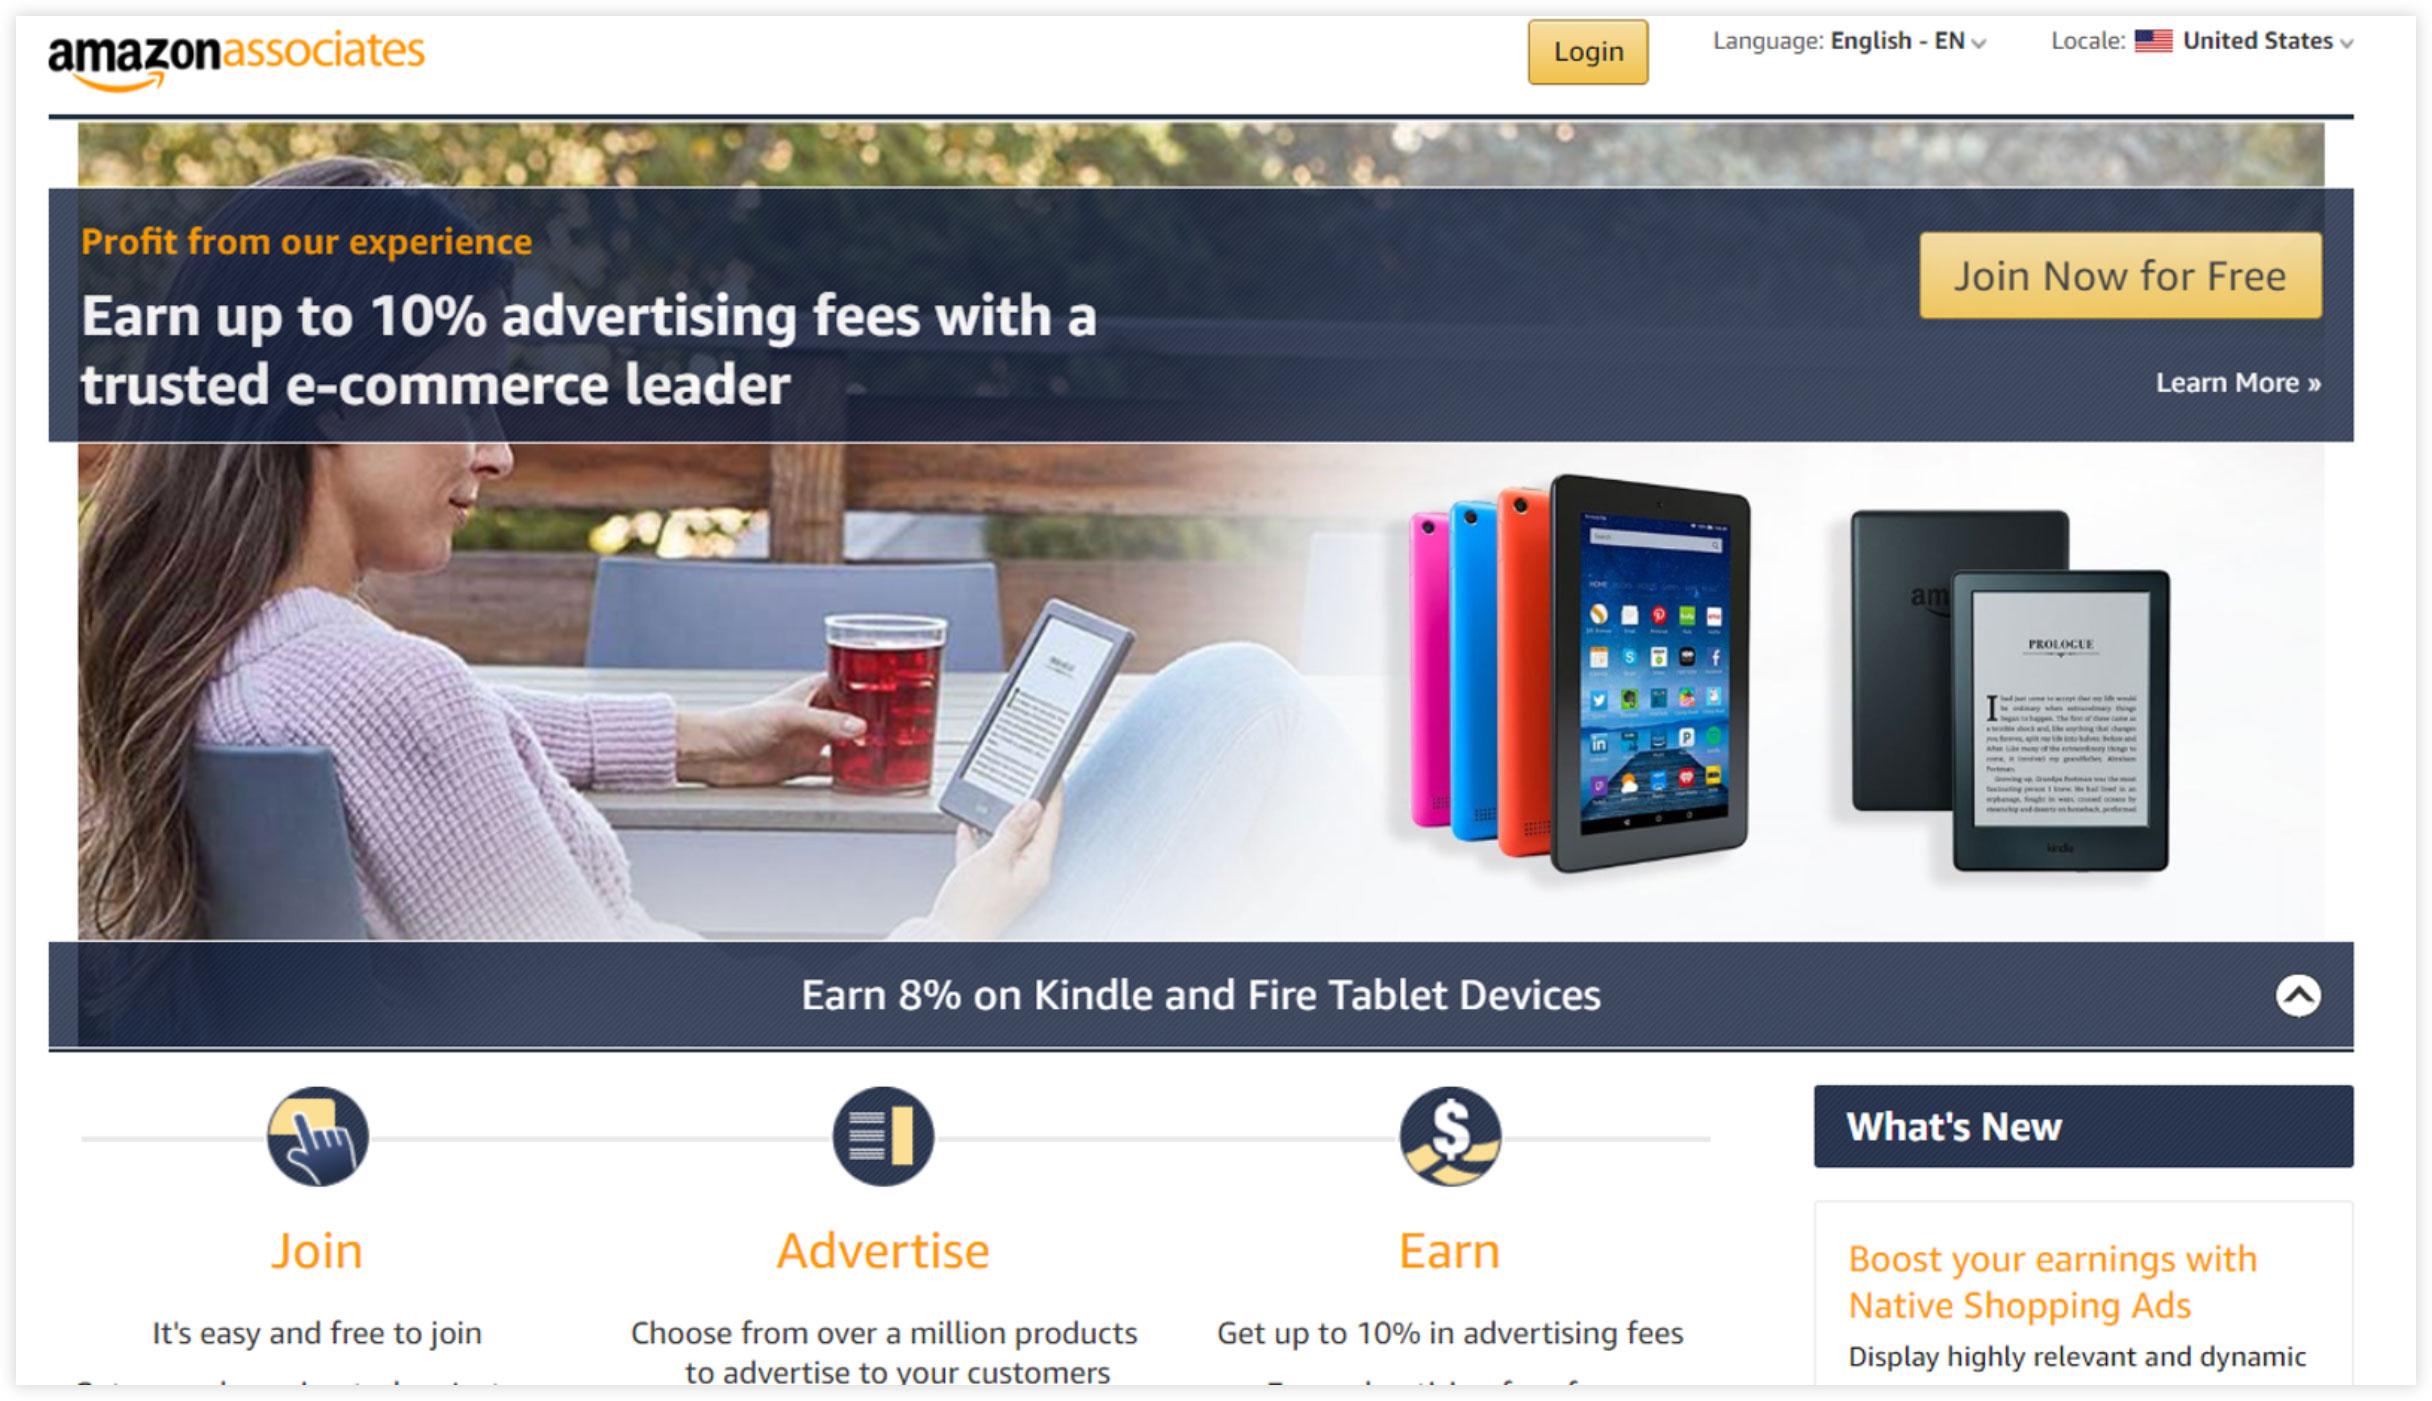 Affiliate Marketplace - Amazon Associates